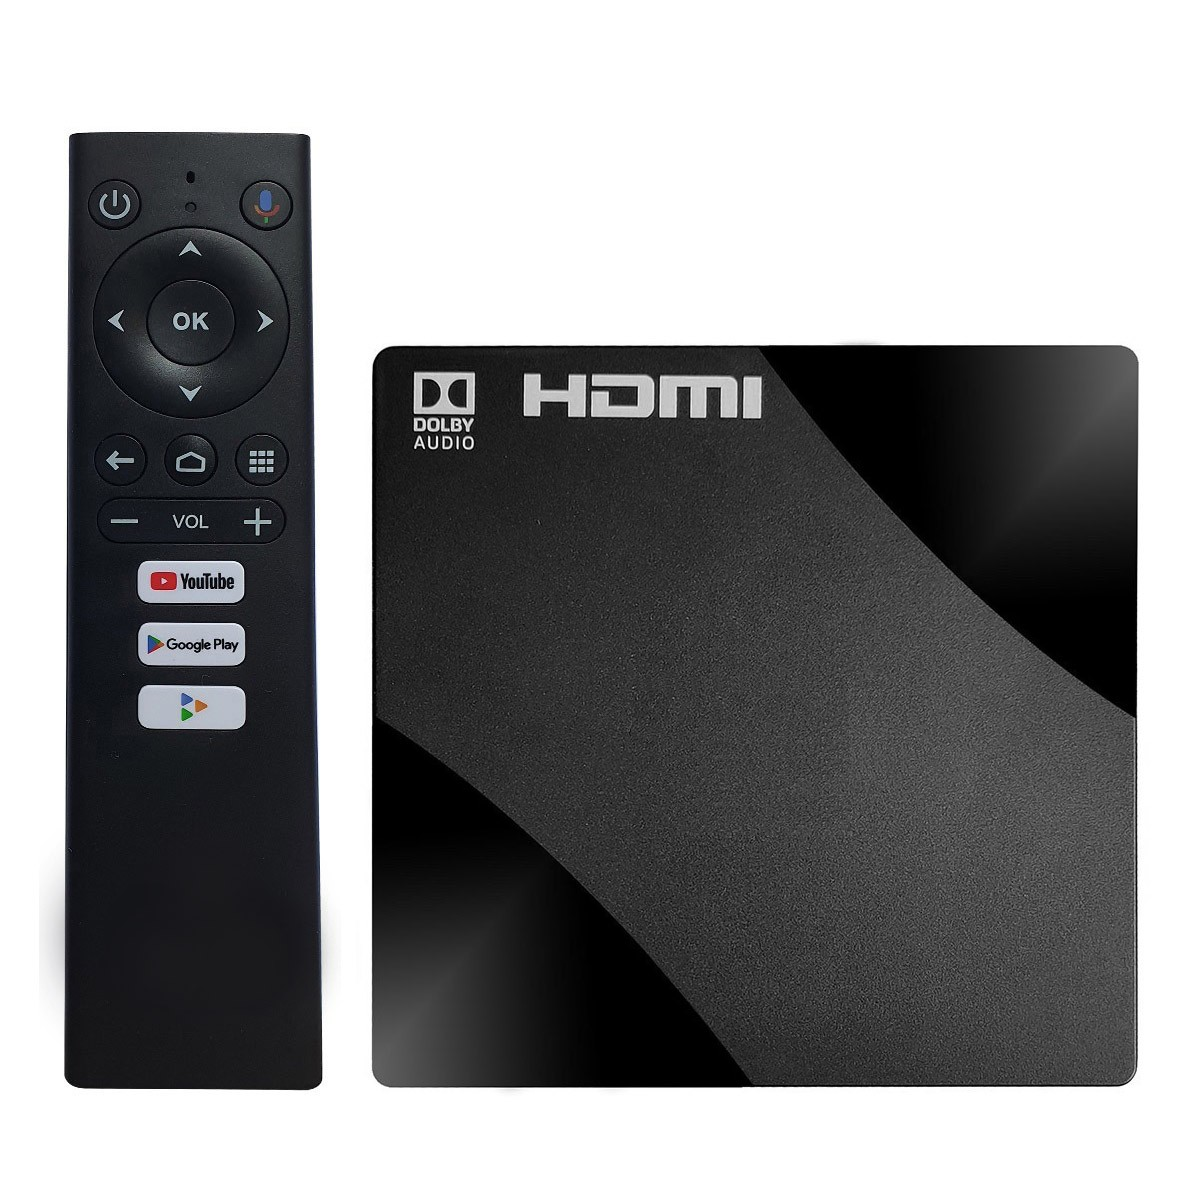 TV BOX SMART 4K CONVERSOR STREAMING ANDROID 8GB 2GB RAM